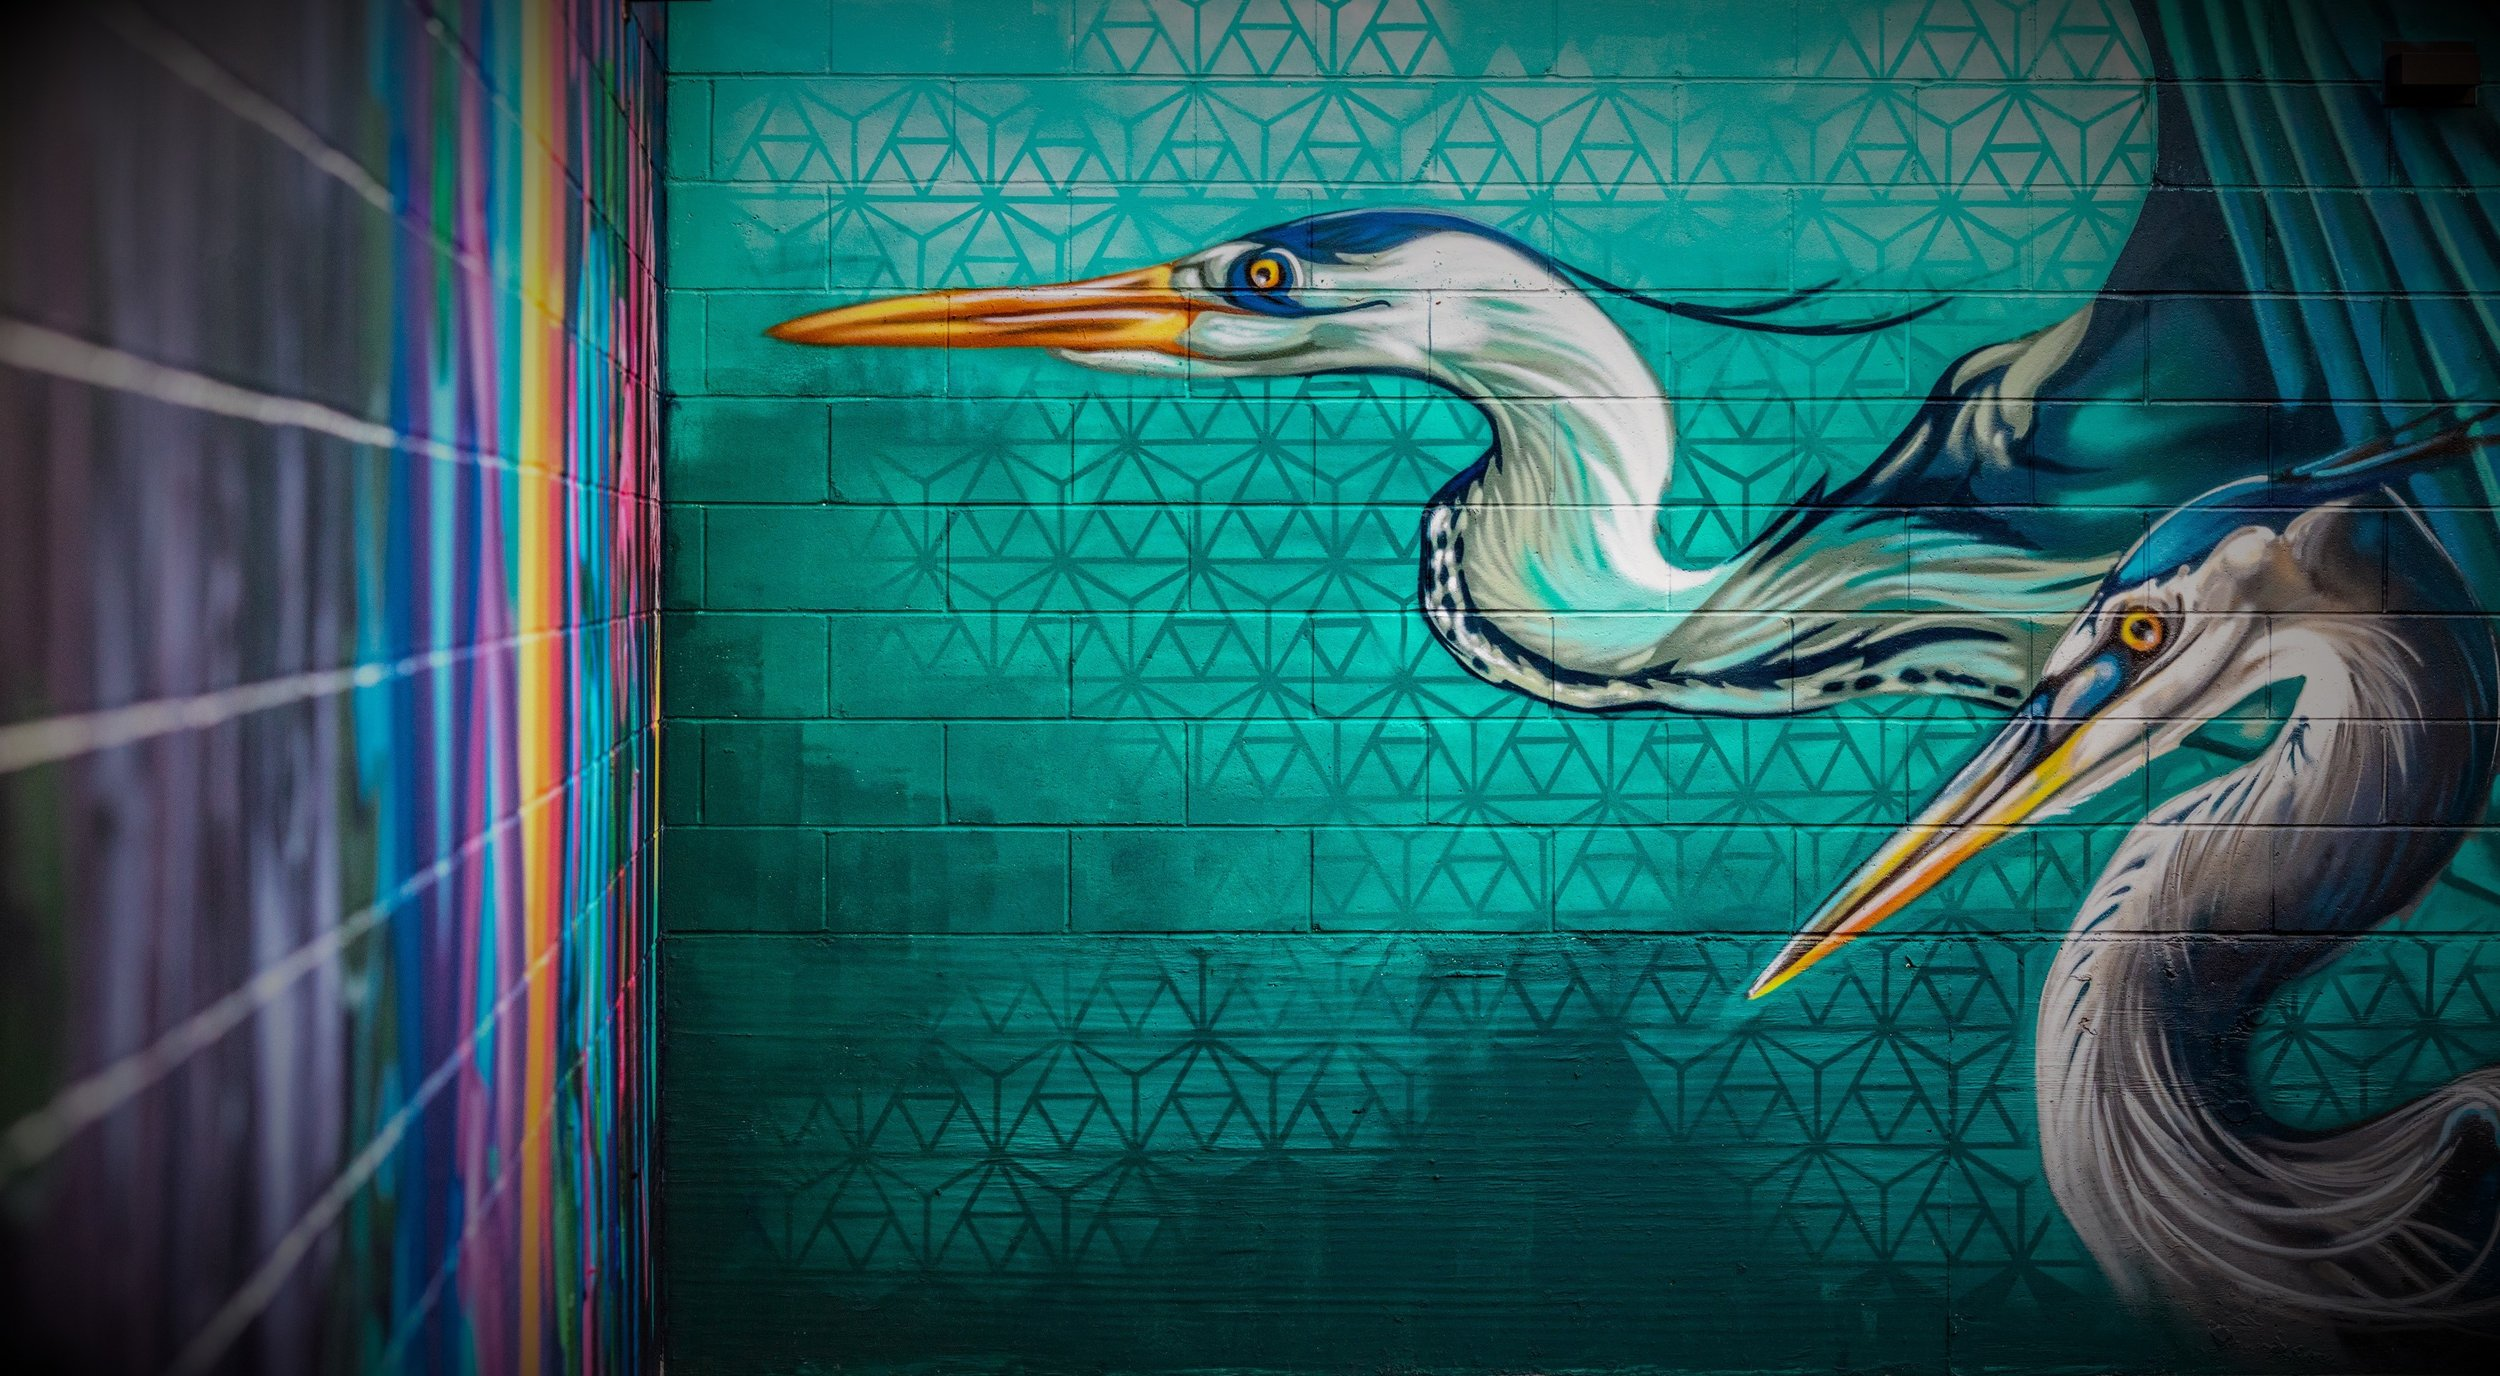 Graffiti House 3 - photo by Max Touhey.jpg